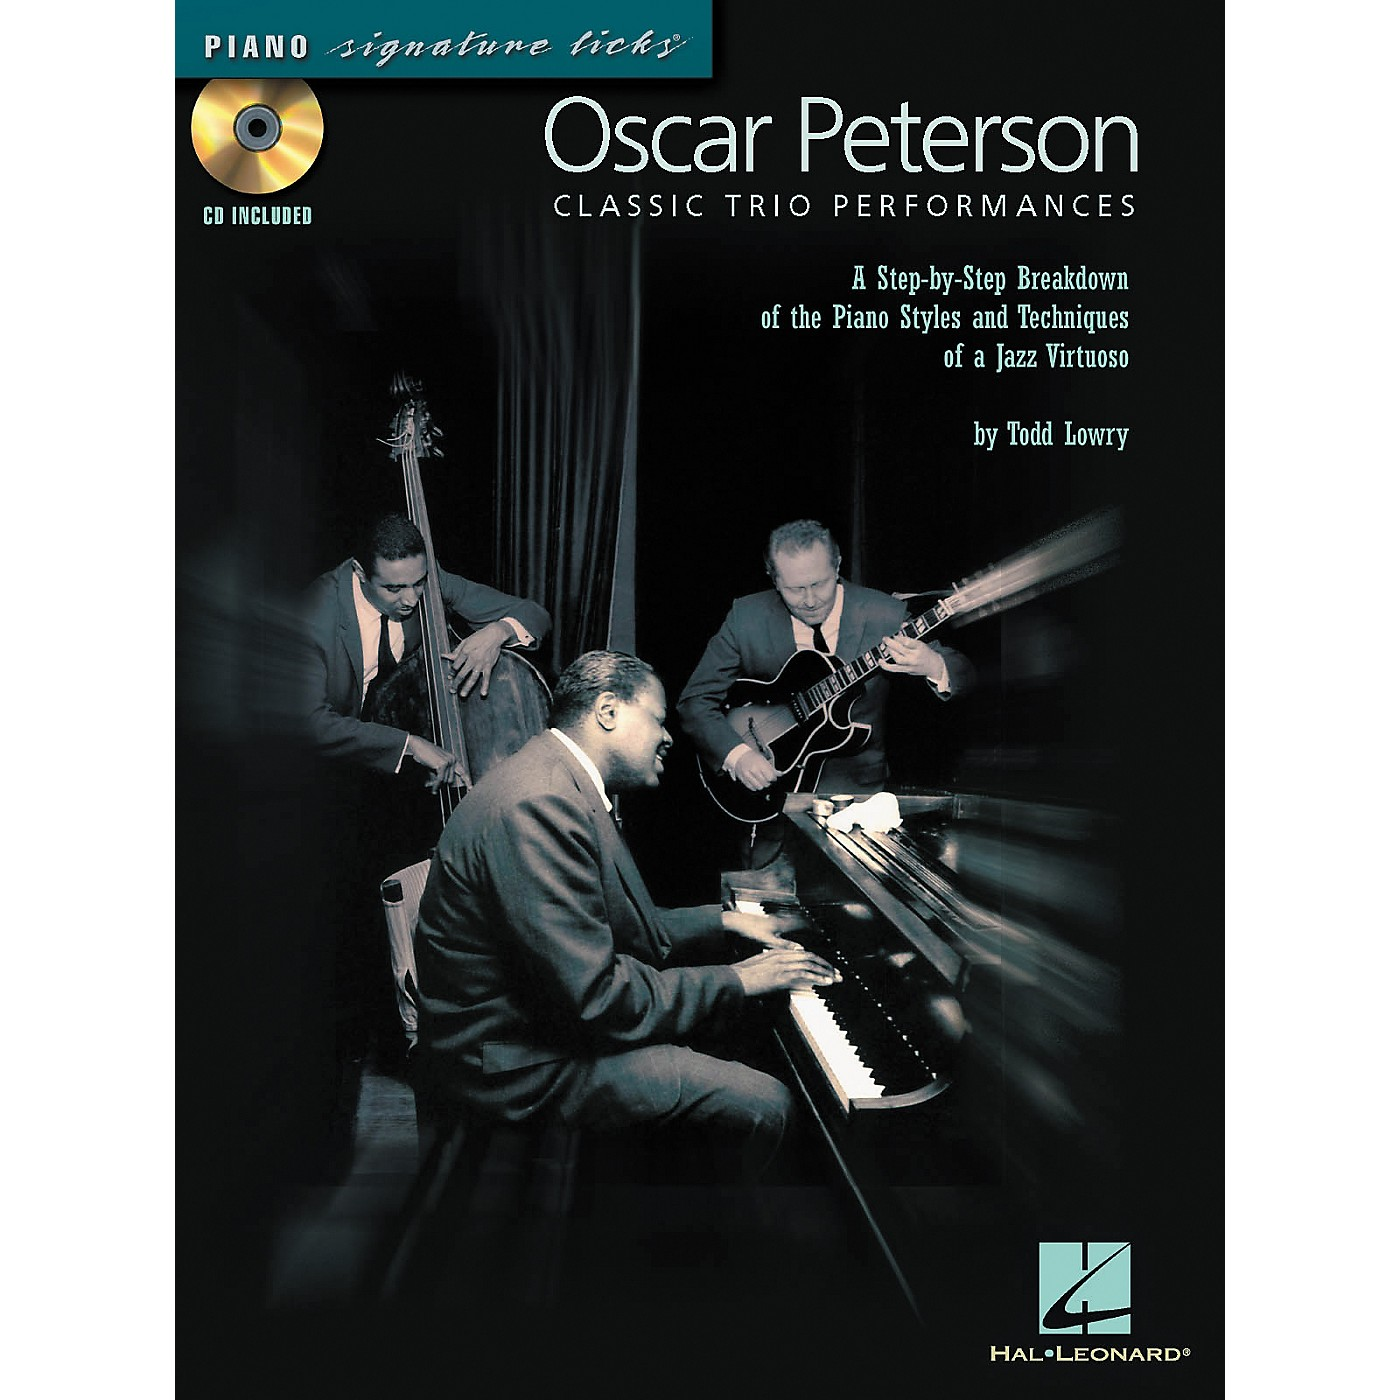 Hal Leonard Oscar Peterson Classic Trio Performances - Piano Signature Licks Series (CD/Booklet) thumbnail